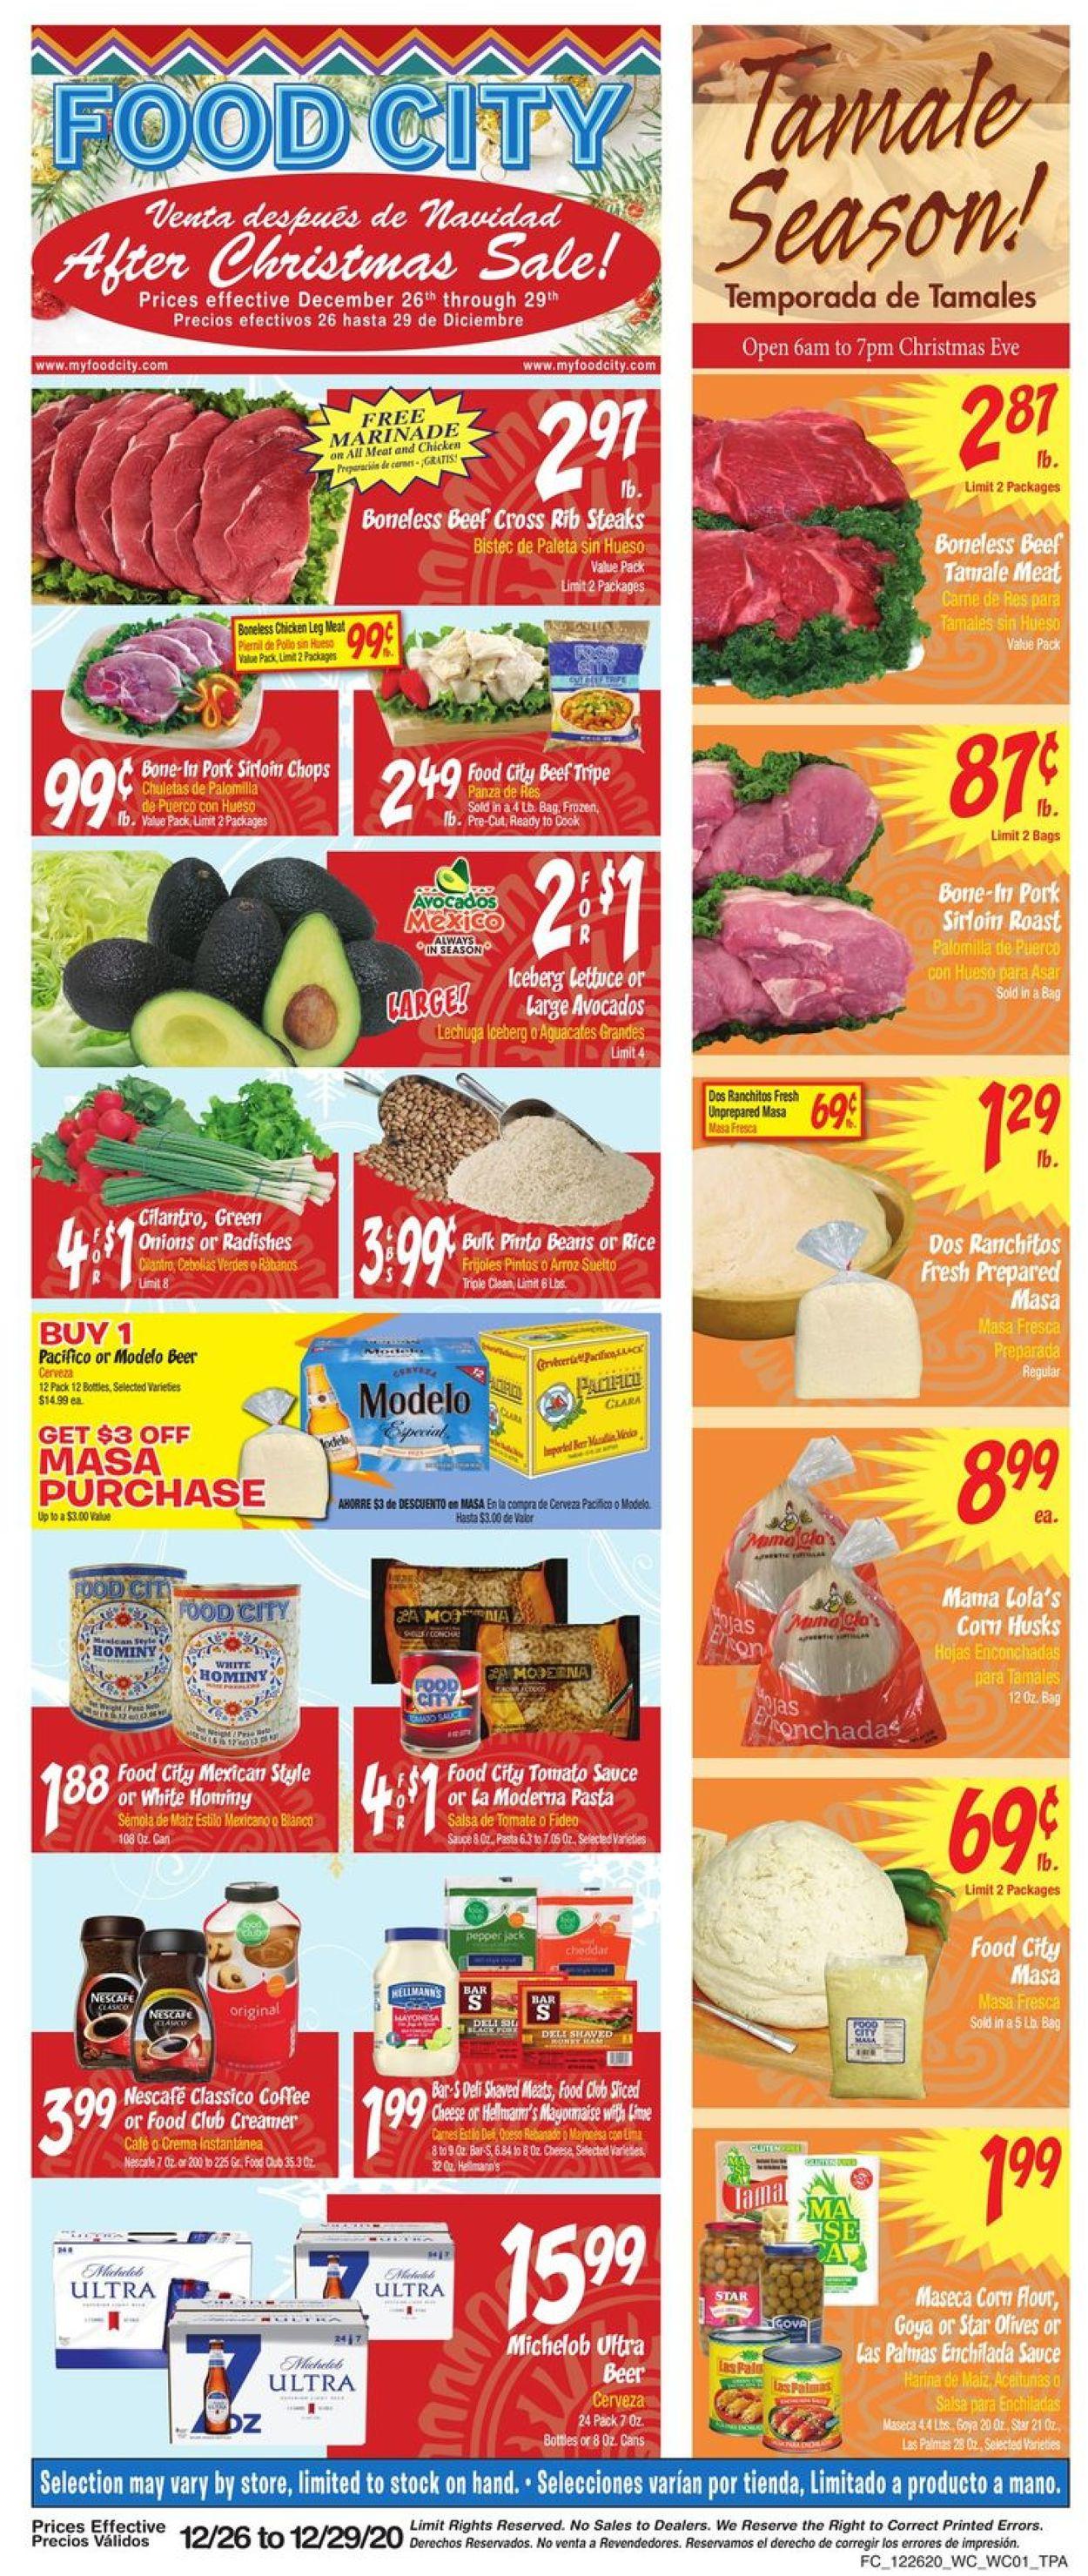 Food City Weekly Ad Circular - valid 12/26-12/29/2020